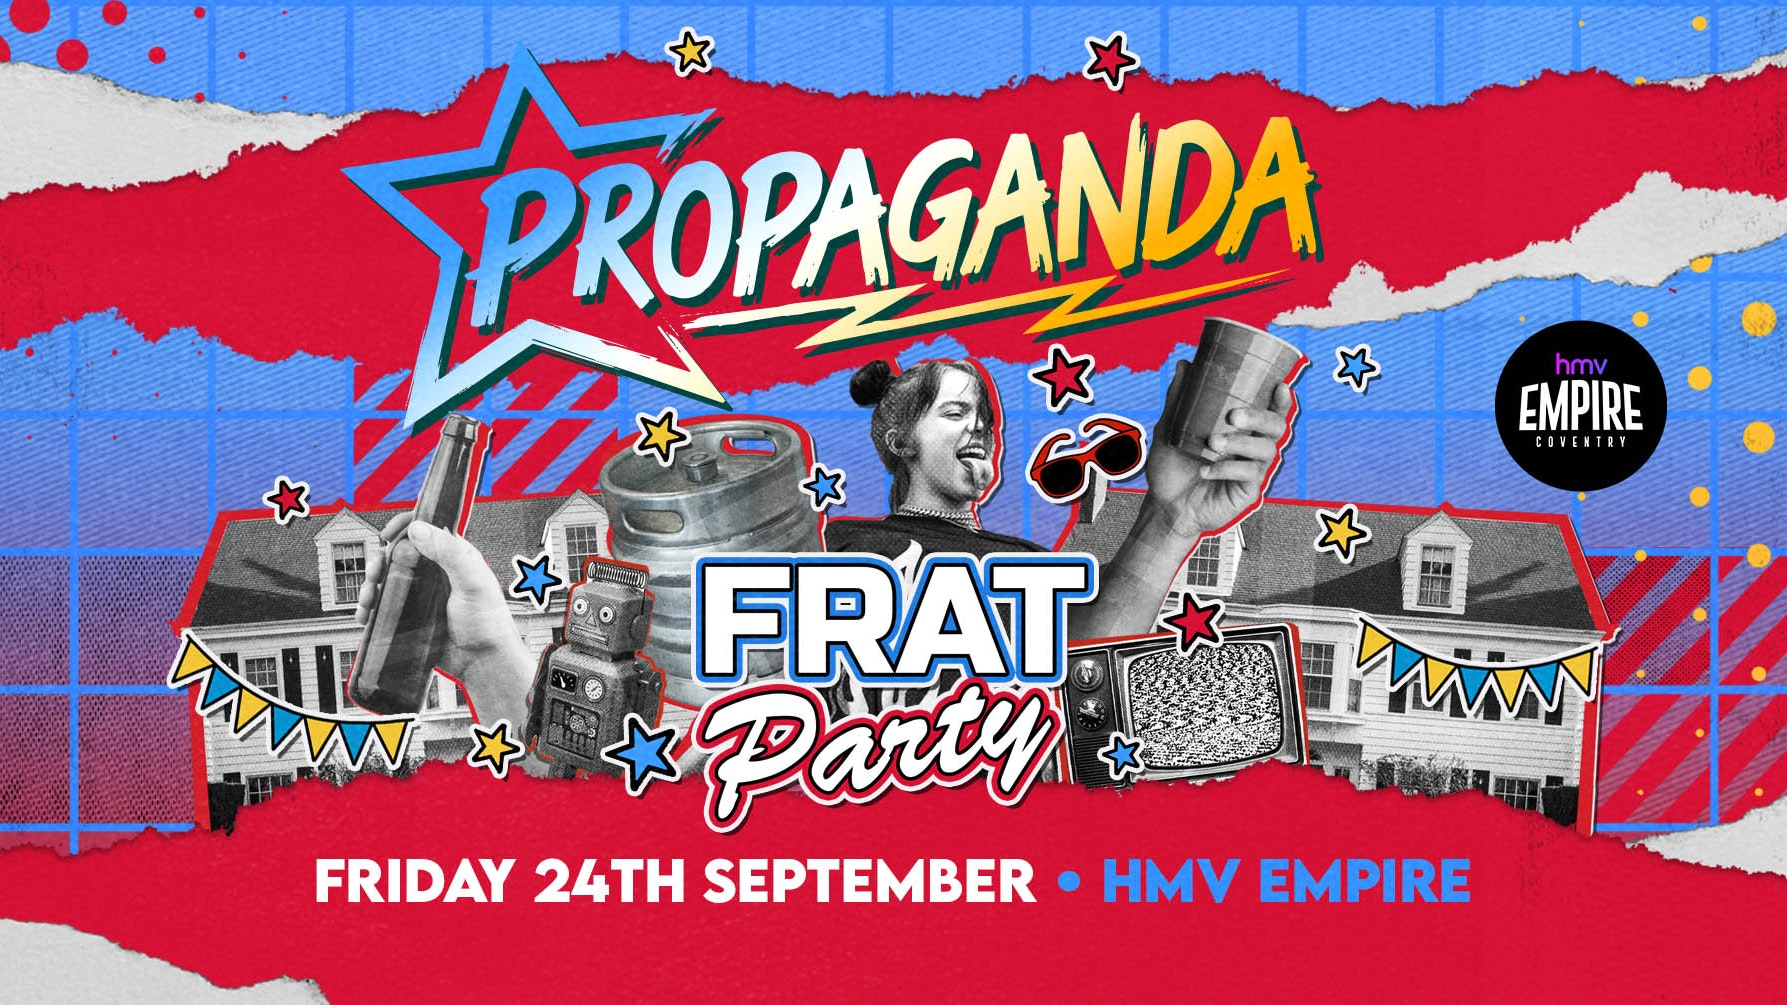 Propaganda Coventry –  Frat Party!